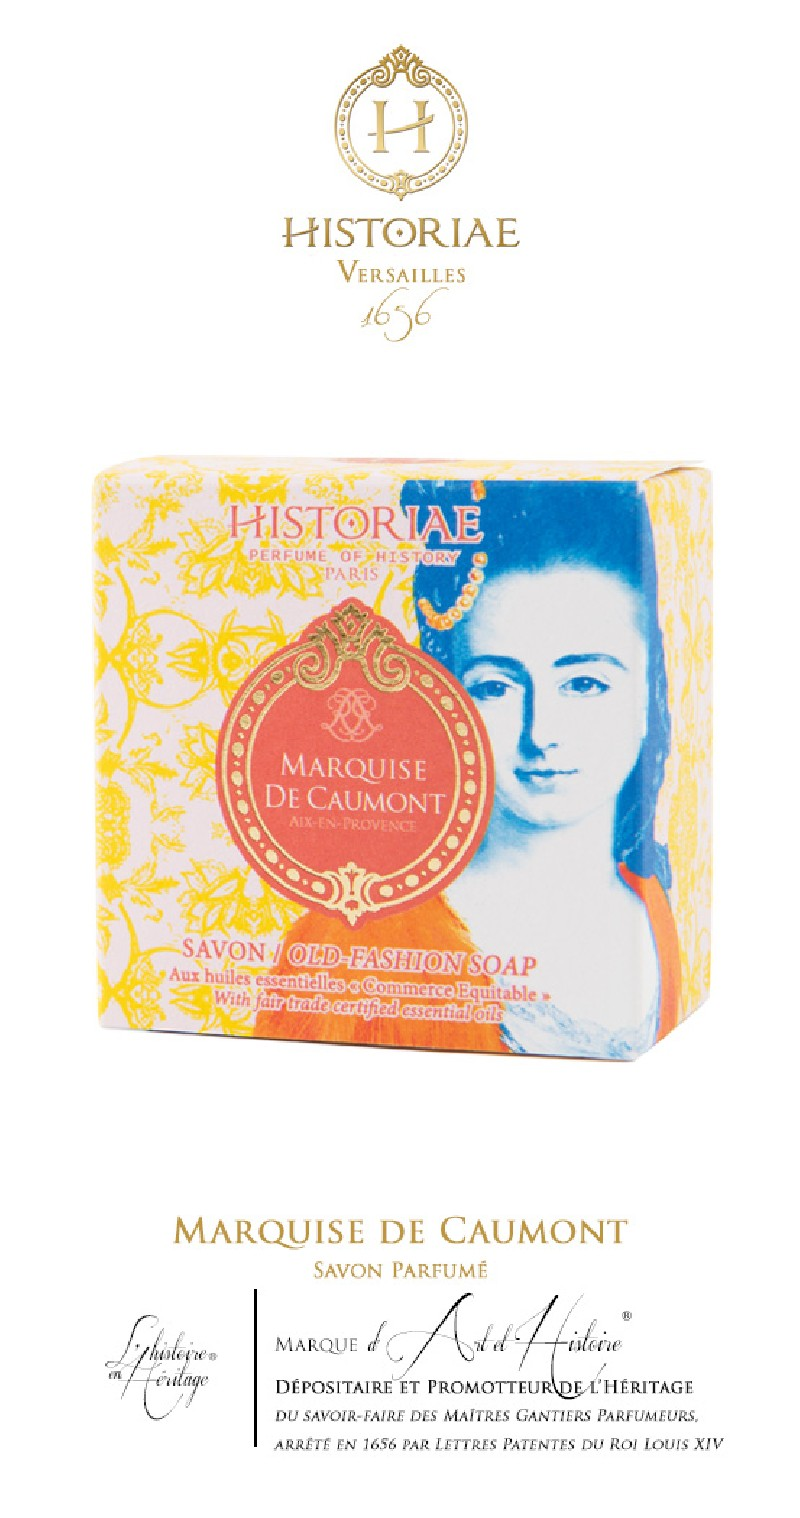 HISTORIAE Marquise de Caumont - Savon parfumé 100g